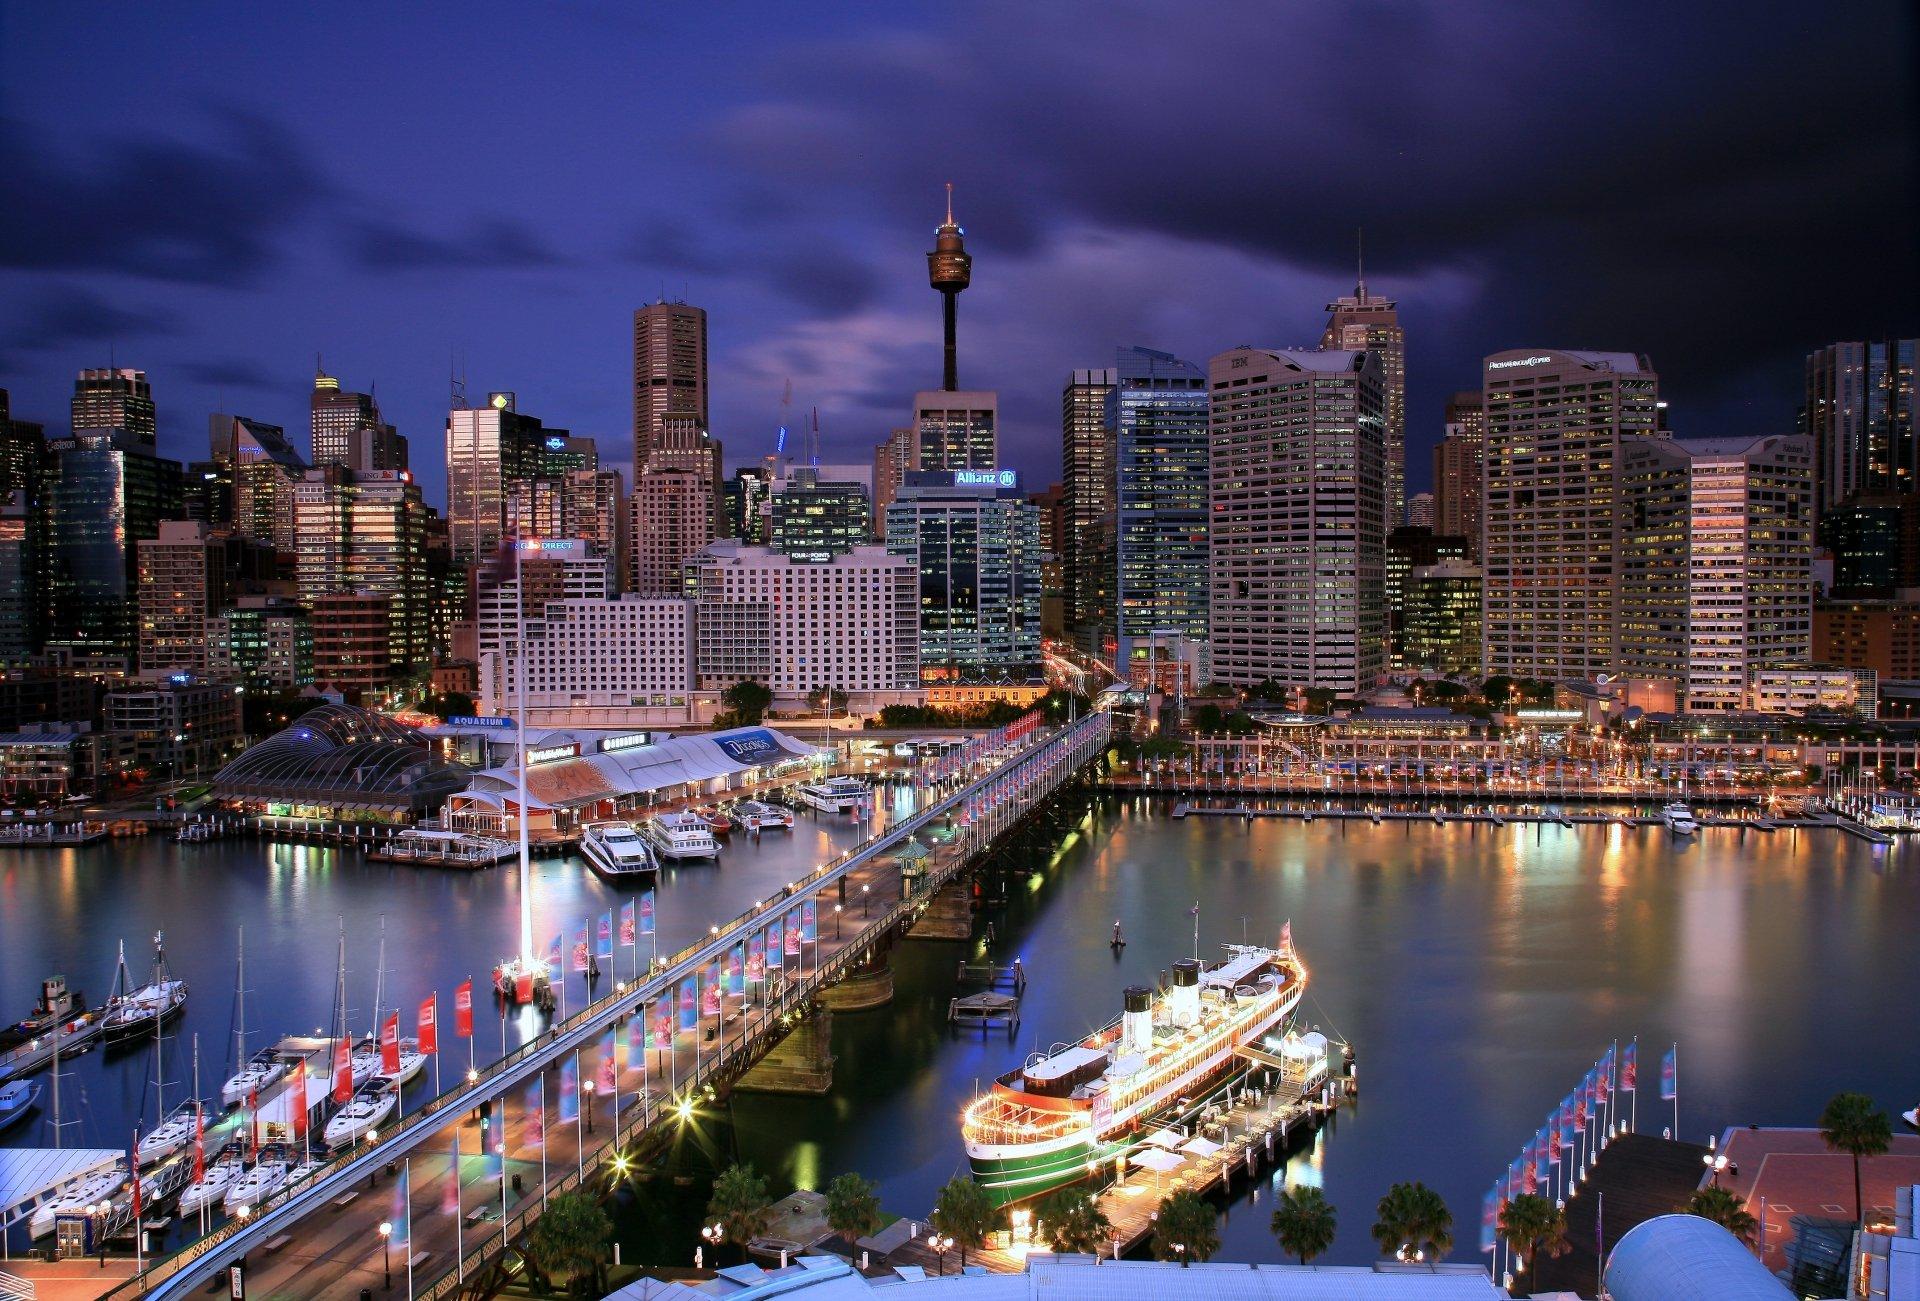 Sydney Australia 4k Ultra HD Wallpaper | Background Image ...